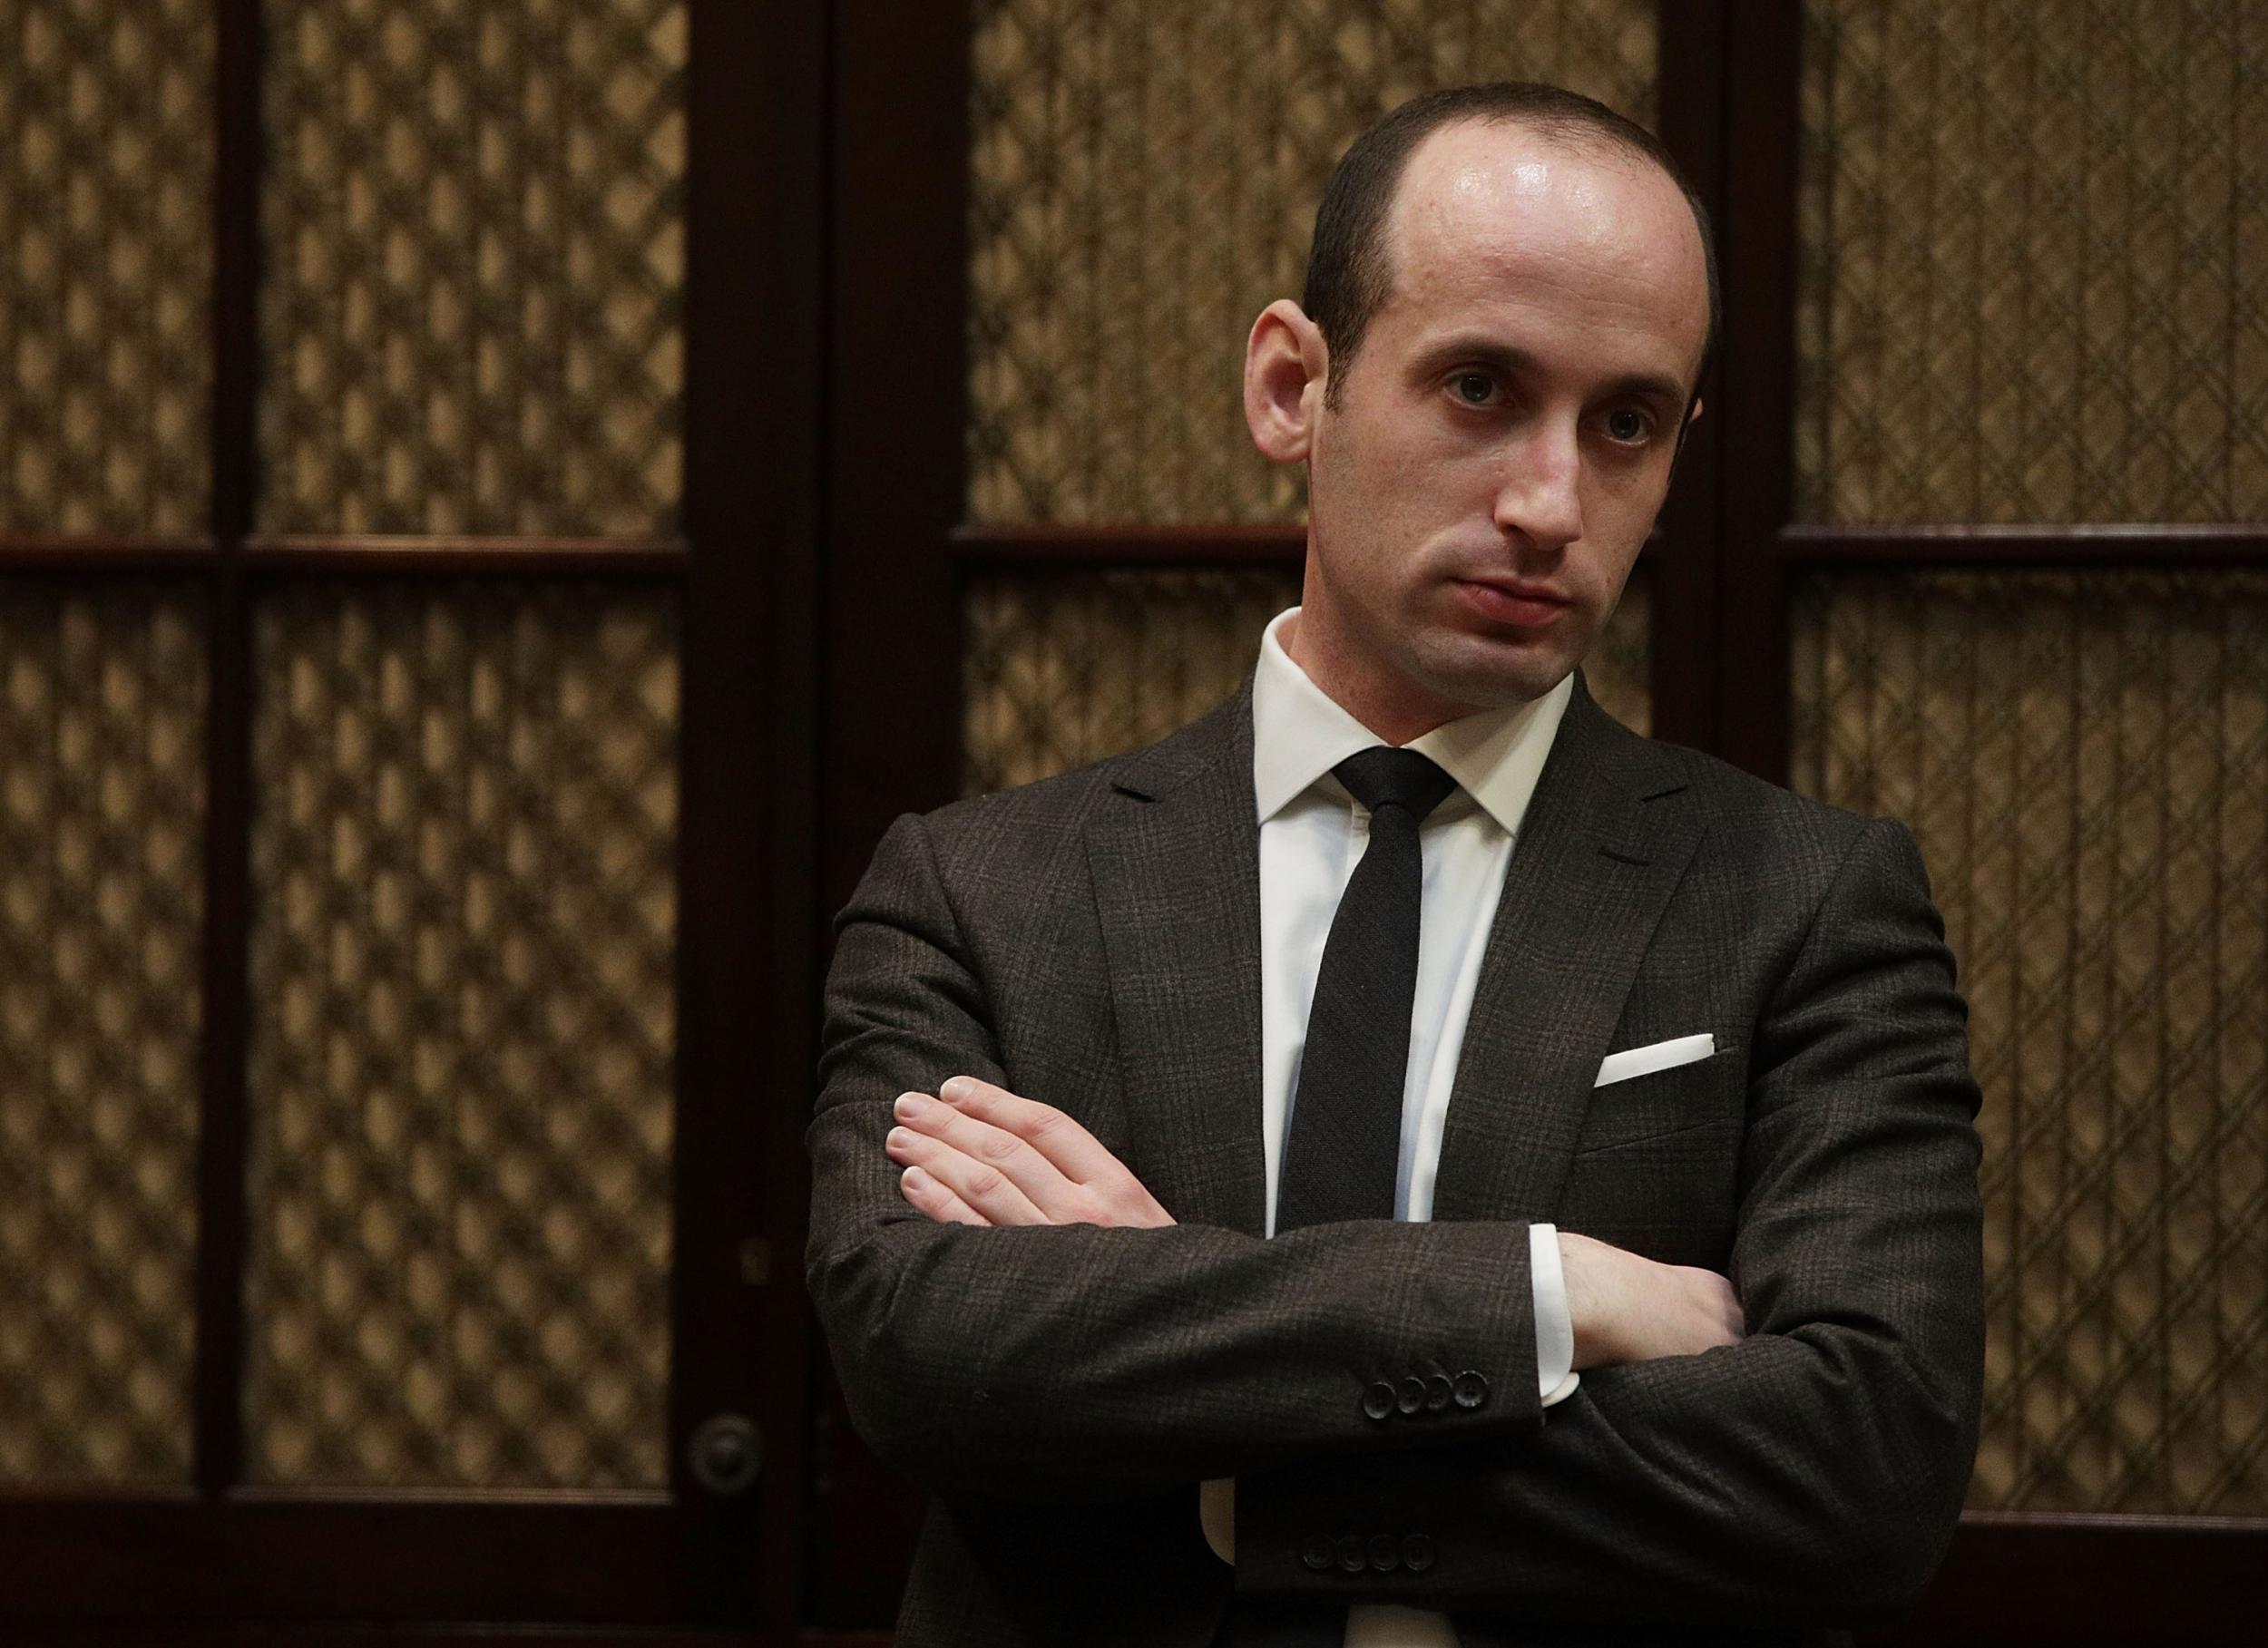 Teacher disciplined for claiming senior White House aide 'ate glue as a kid'